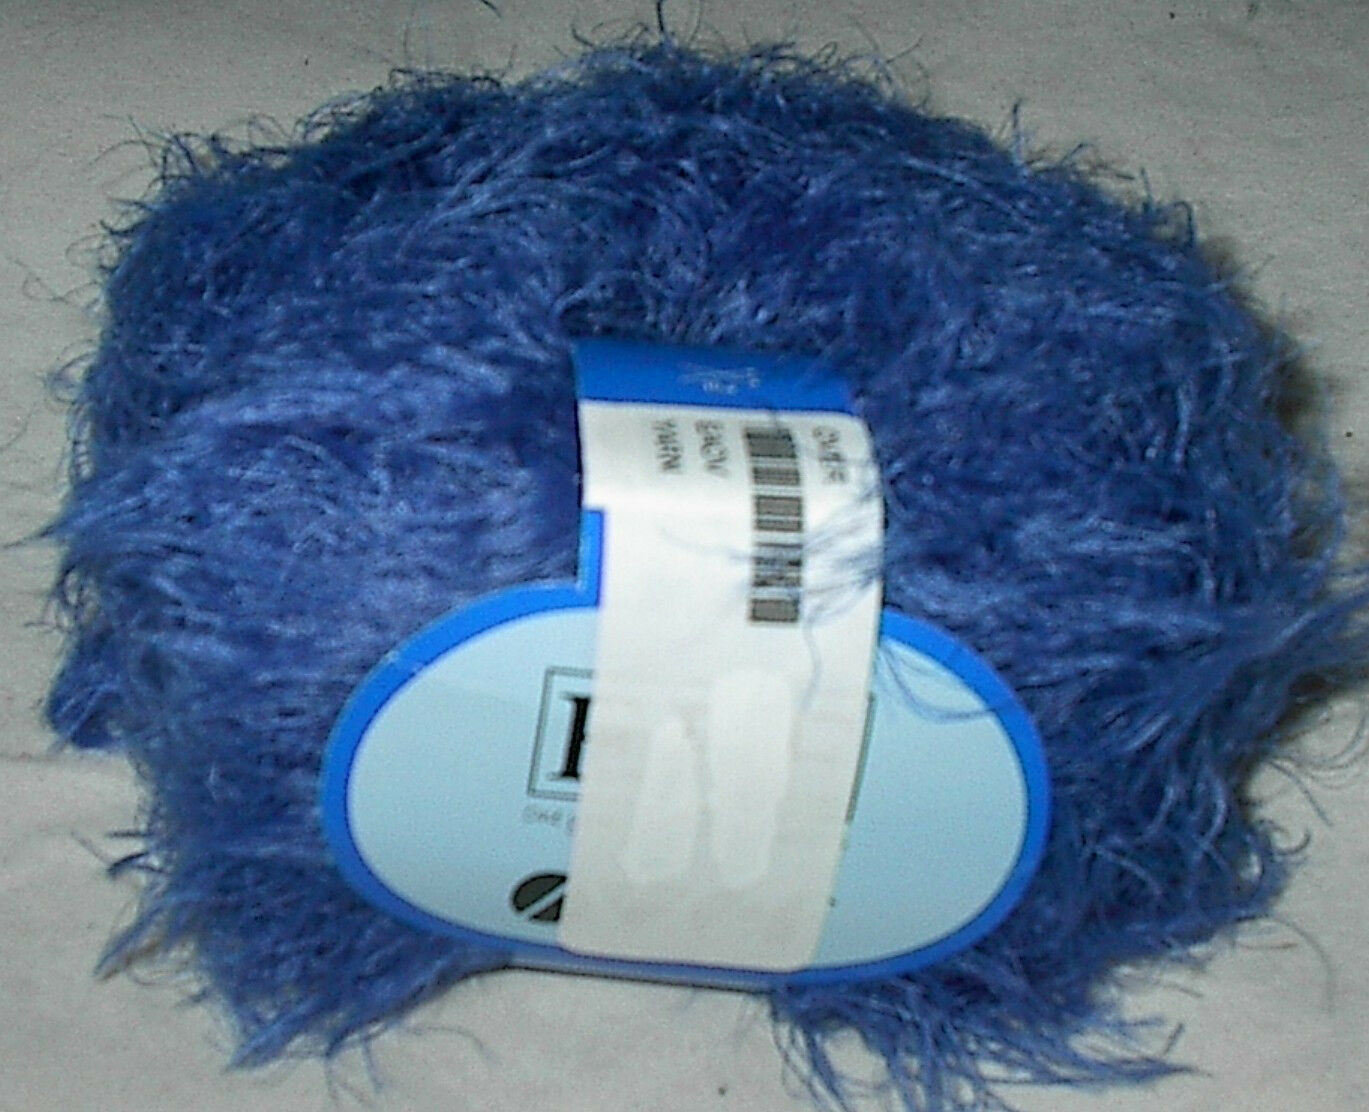 6Pk Spinrite 241089-89610 Classic Wool Bulky Yarn-Gold